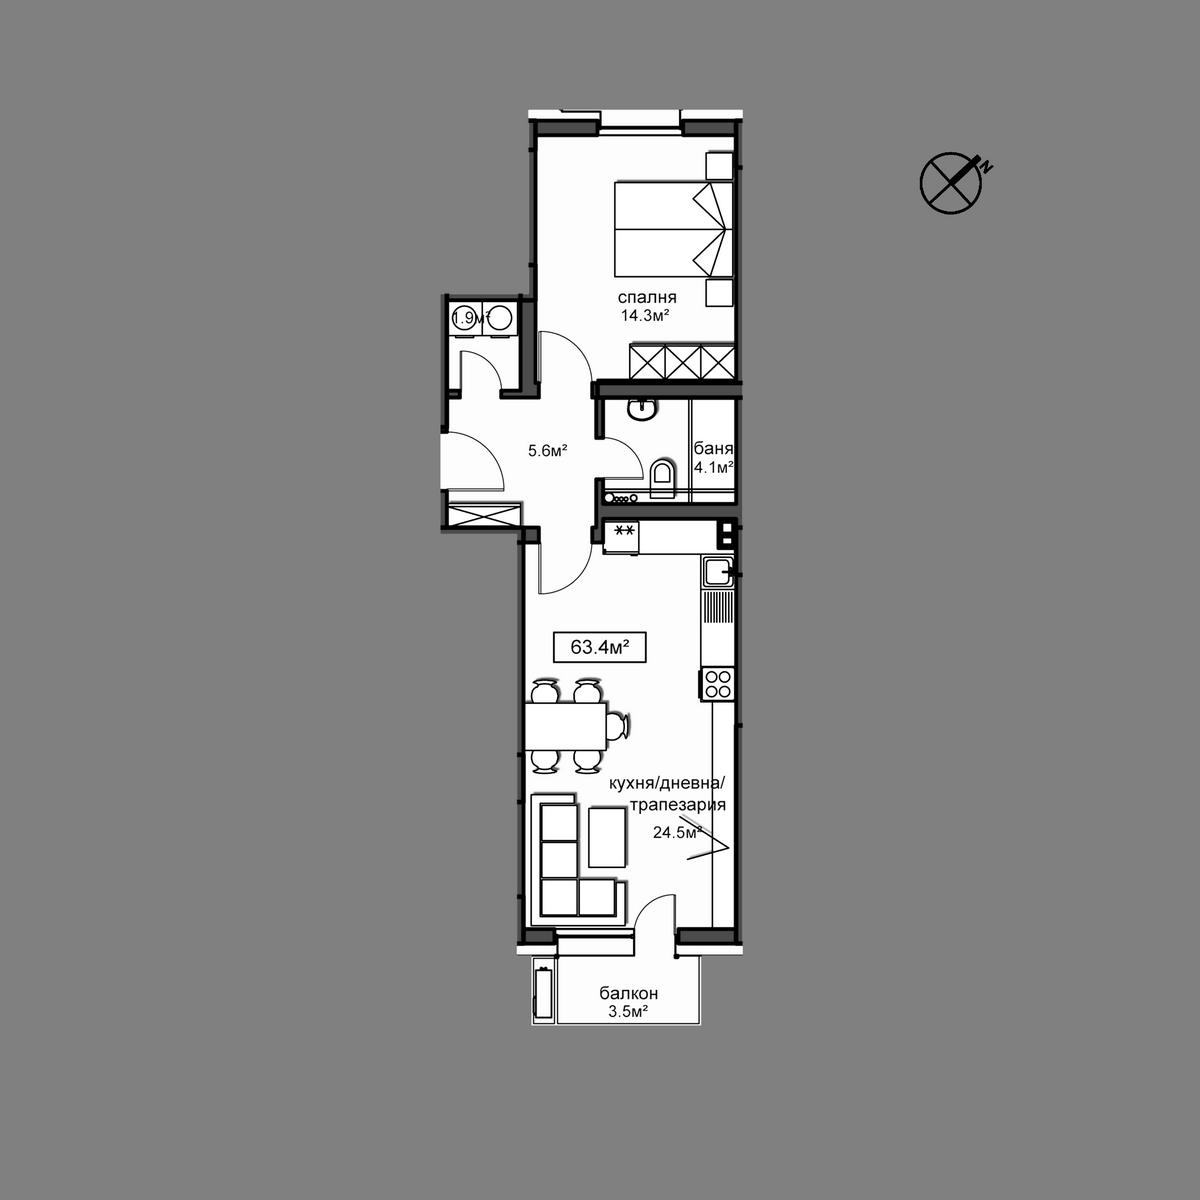 Продава апартамент ново строителство - Апартамент А18